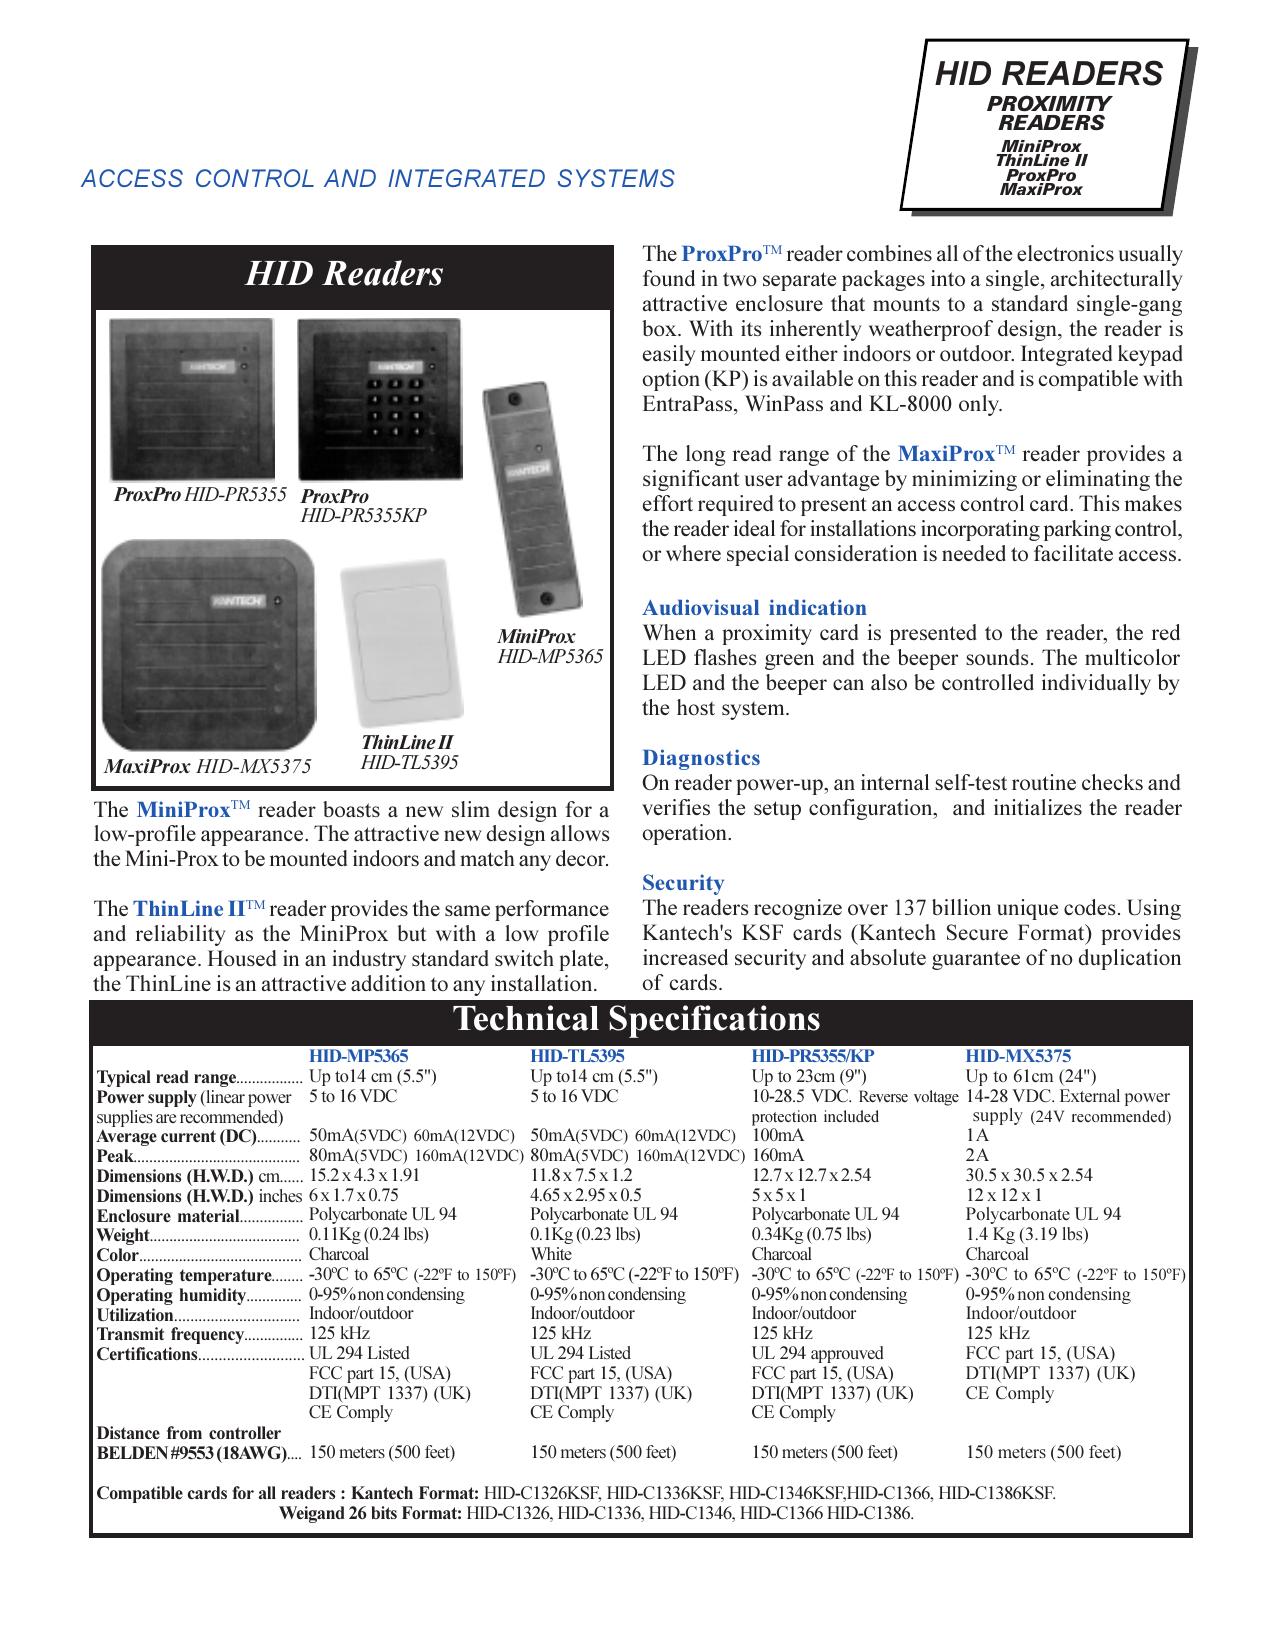 HID readers Cutsheet 9702   manualzz.com on